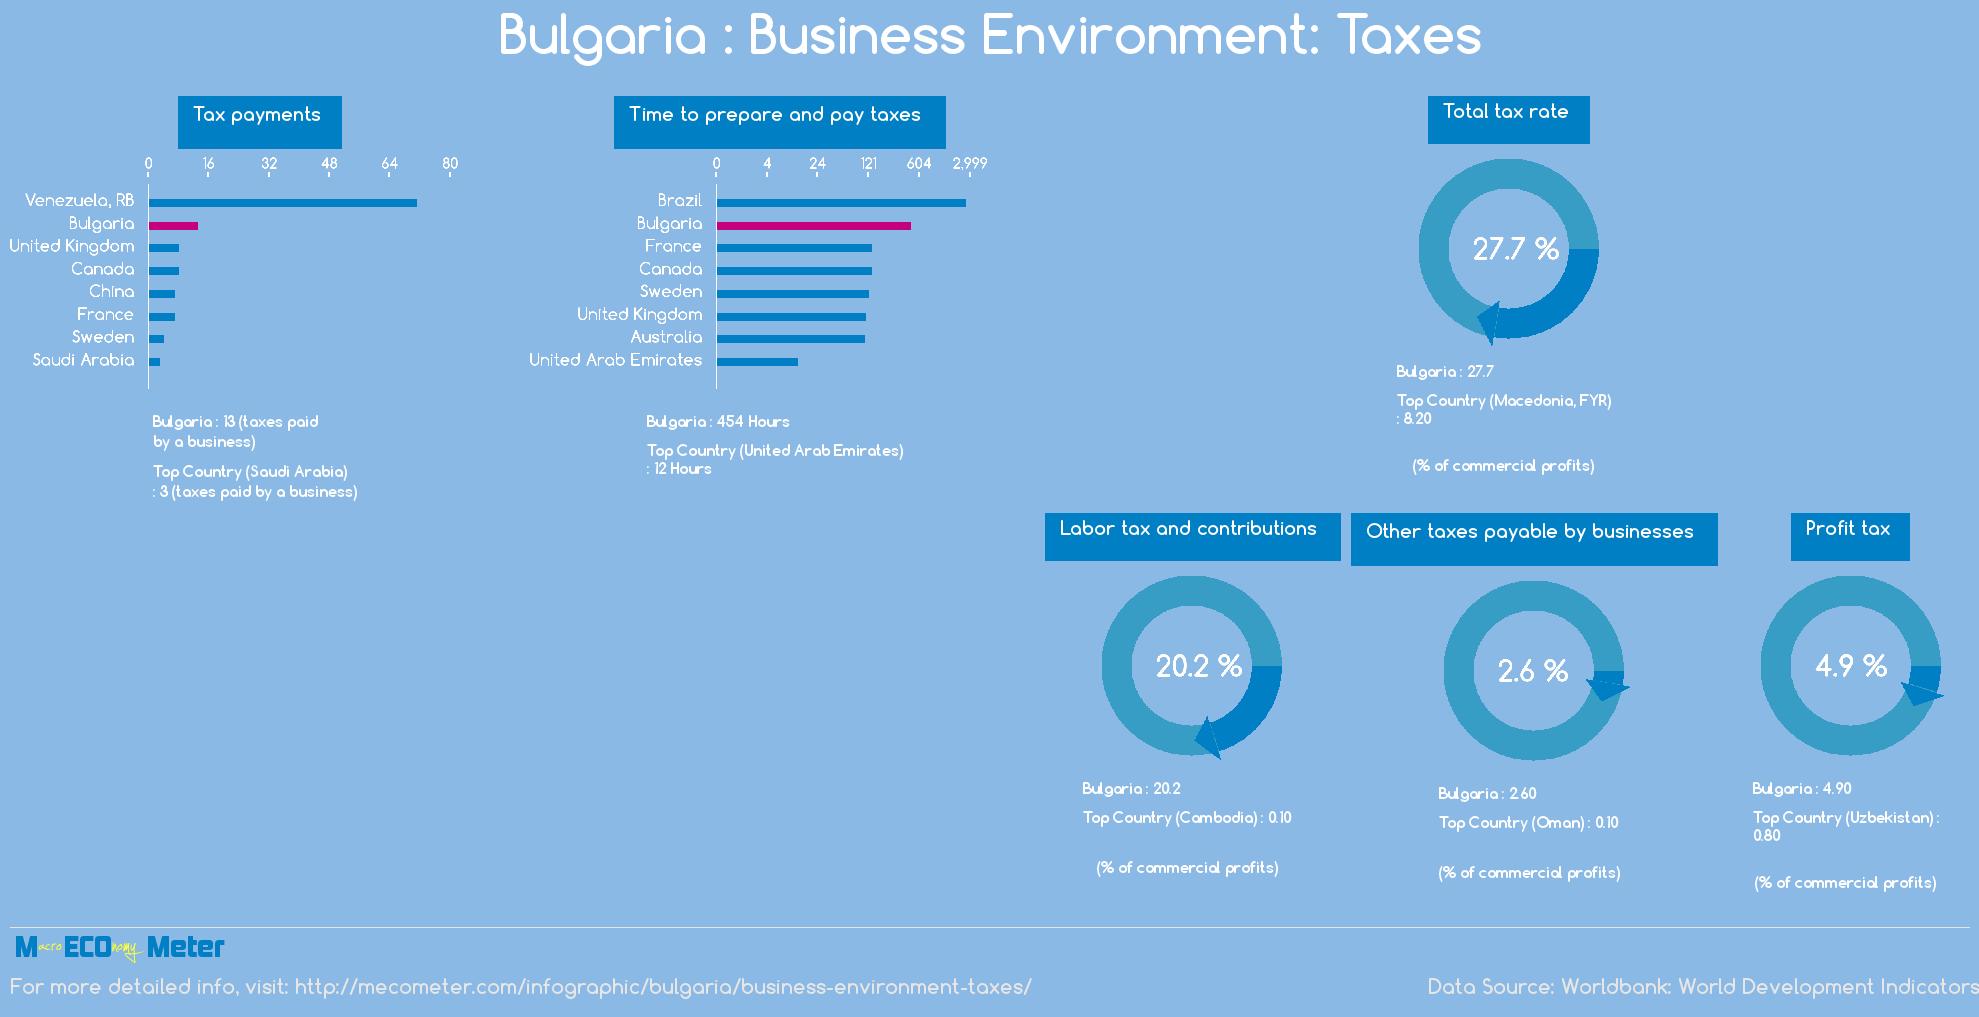 Bulgaria : Business Environment: Taxes